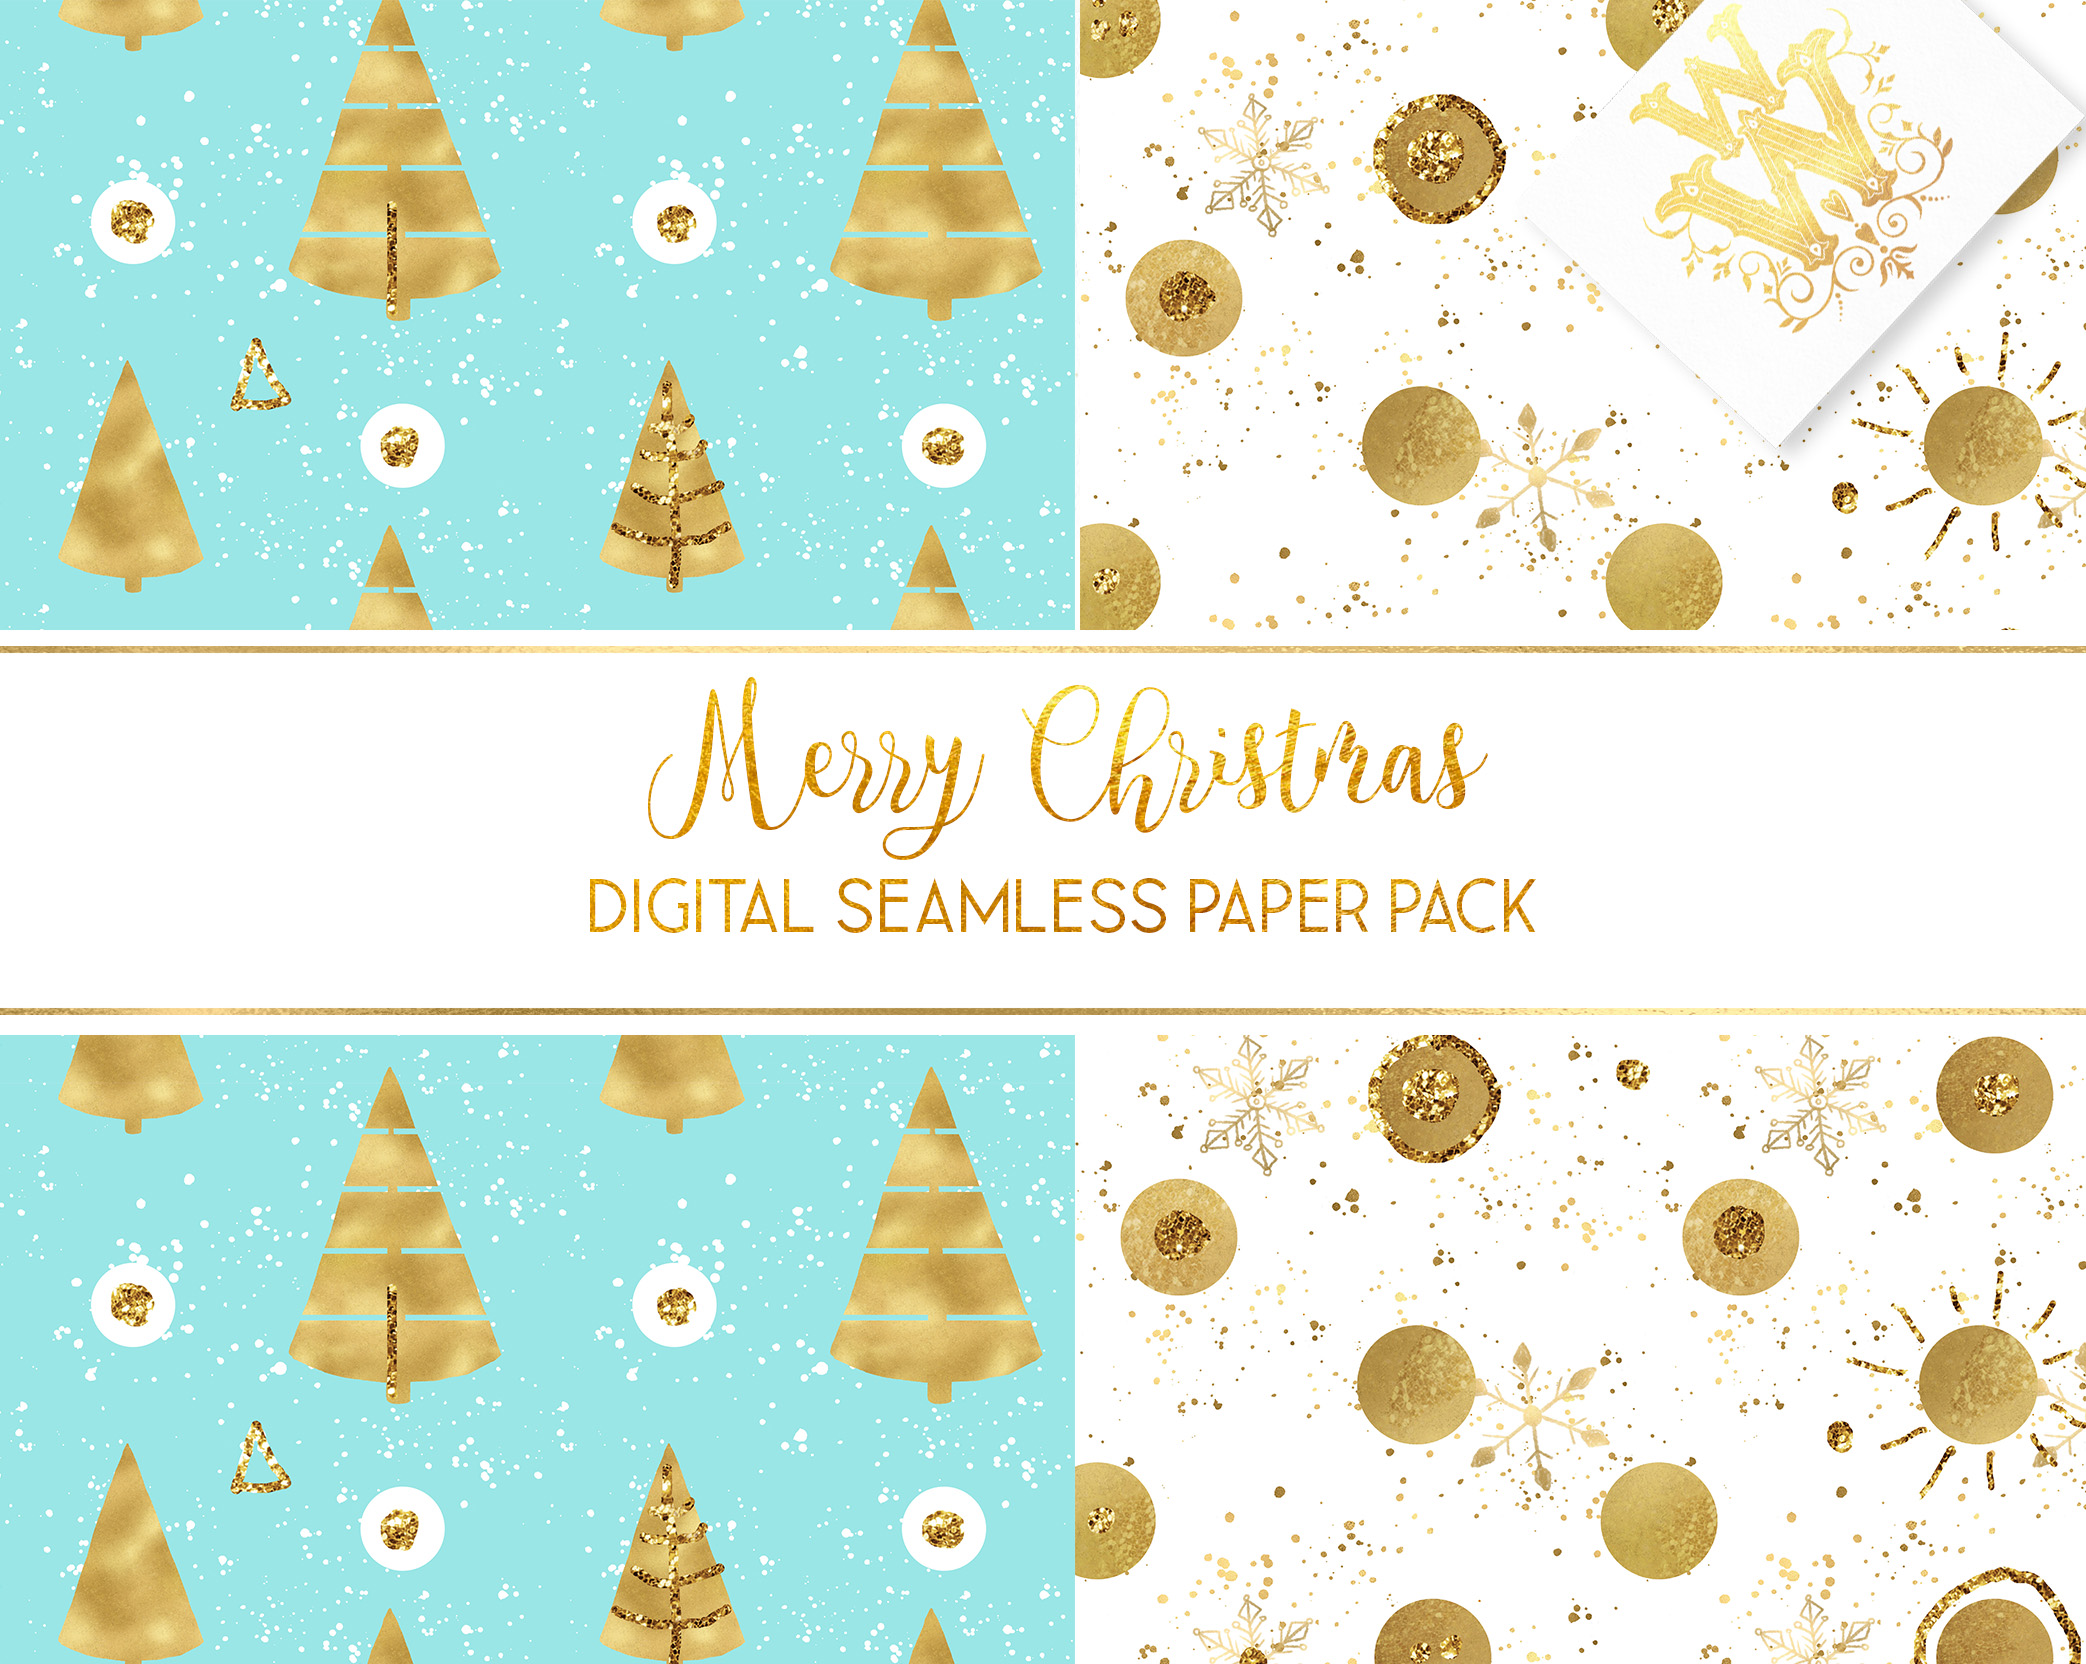 Christmas digital paper pack, seamless pattern snowflake example image 2